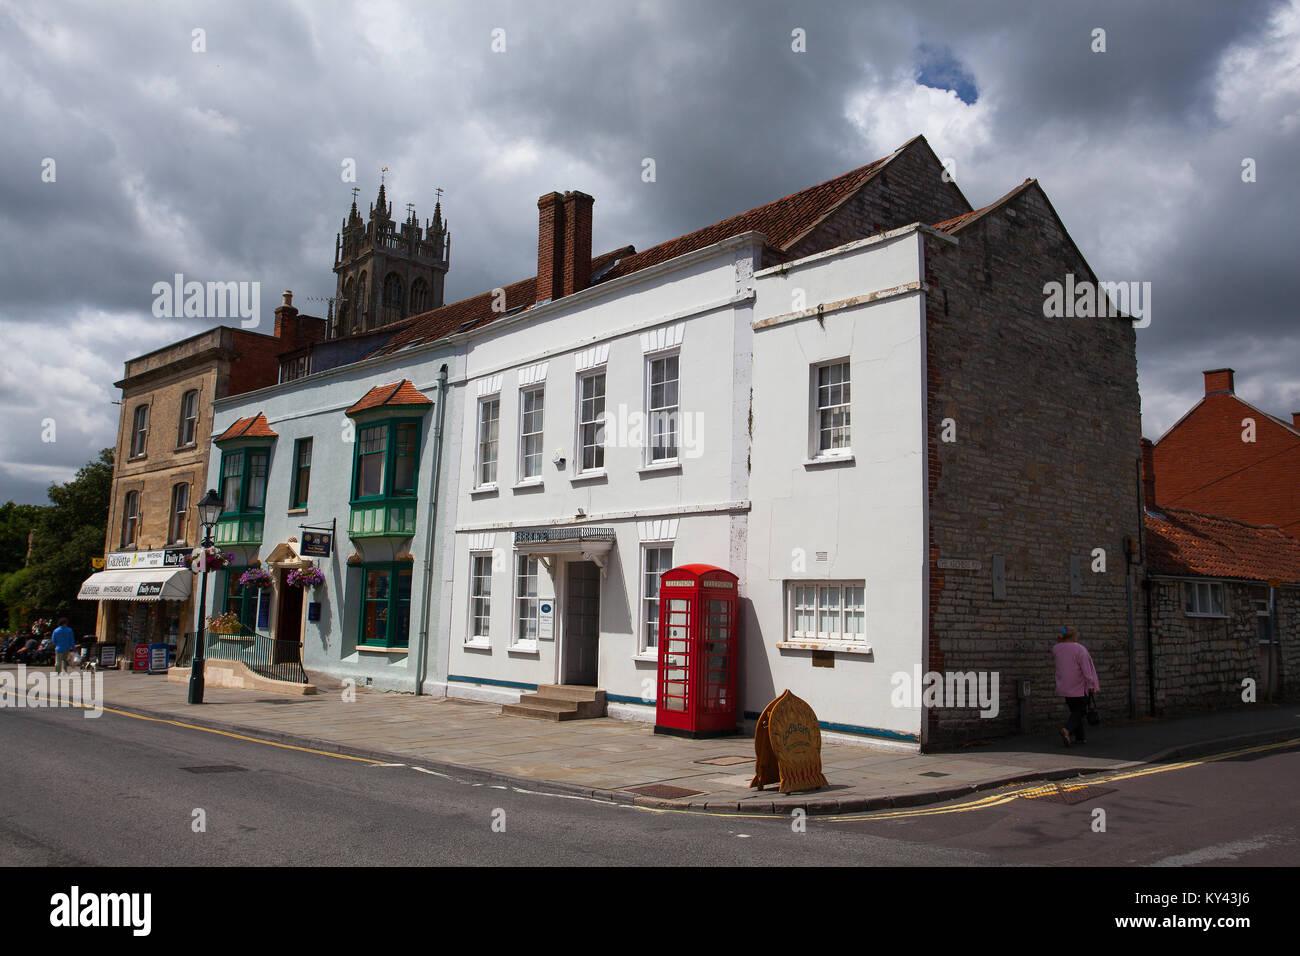 Glastonbury, England – July 15, 2010: Main street in Glastonbury, Somerset. Glastonbury is a town in southwest England. - Stock Image